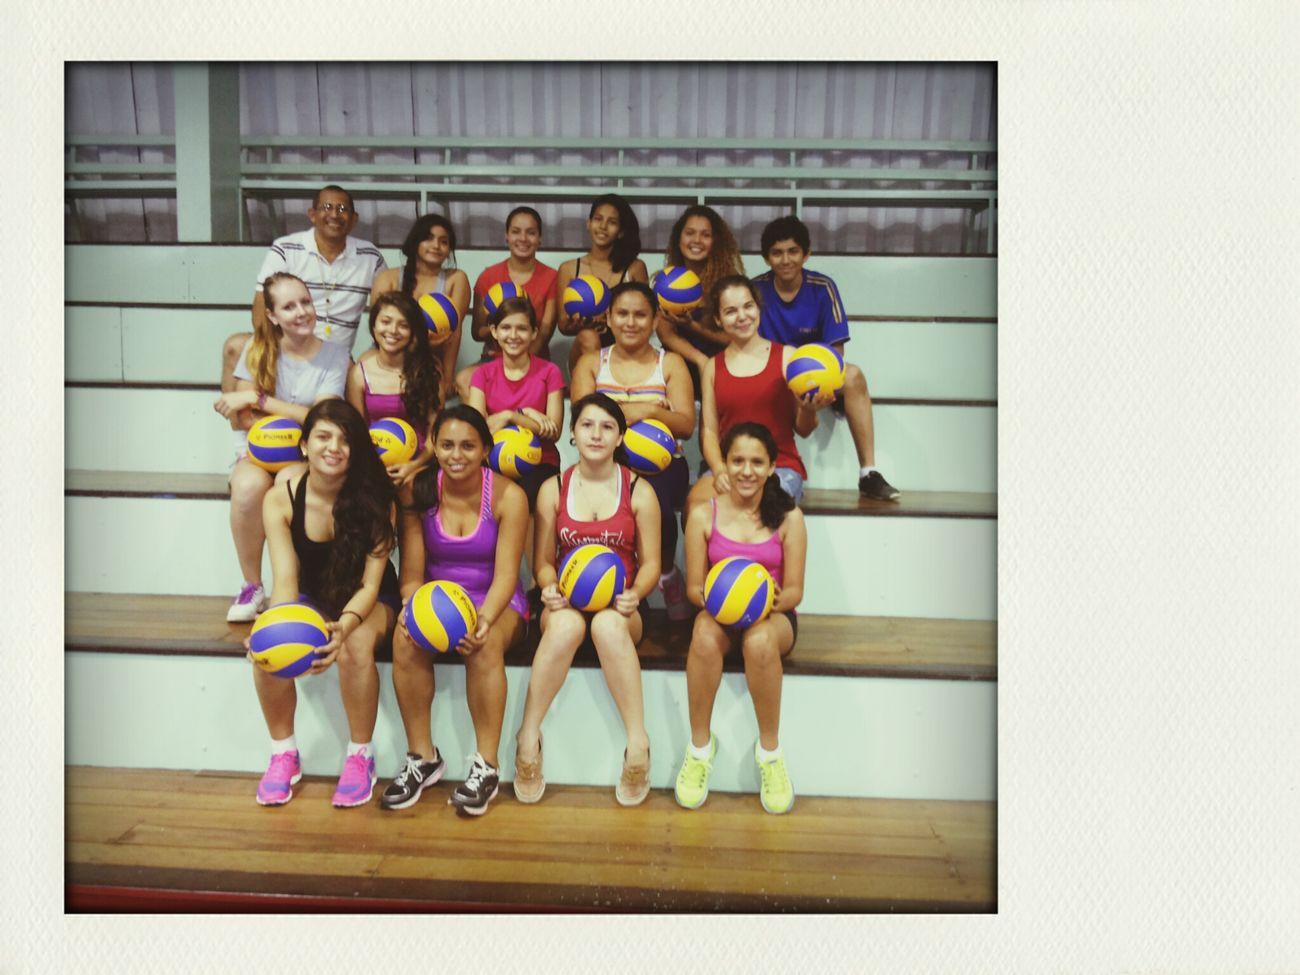 New_balls Volleyball Team